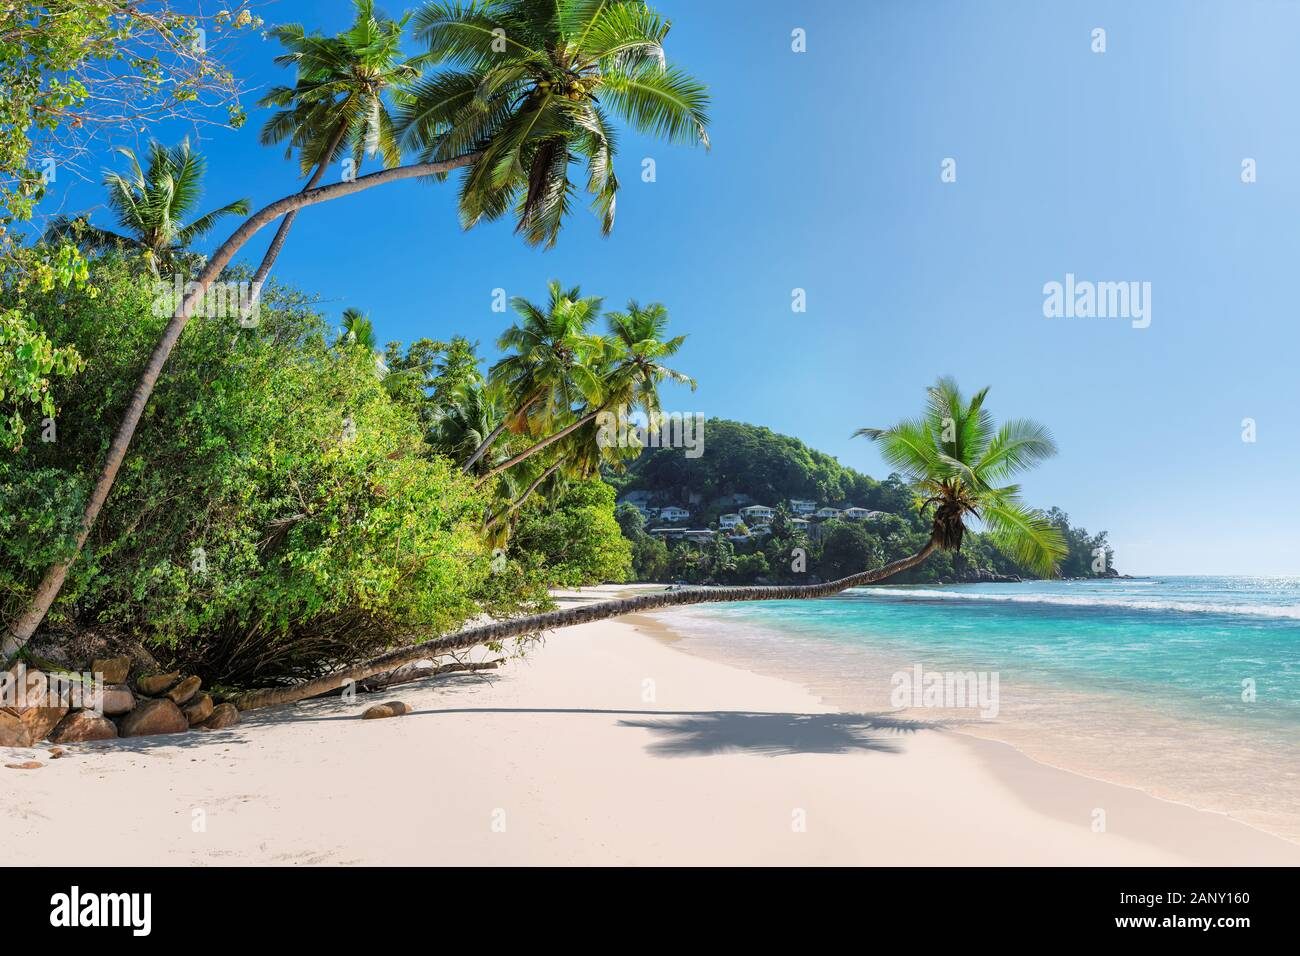 Hermosas palmeras de coco en Anse Takamaka beach, Mahe Island, Seychelles Foto de stock